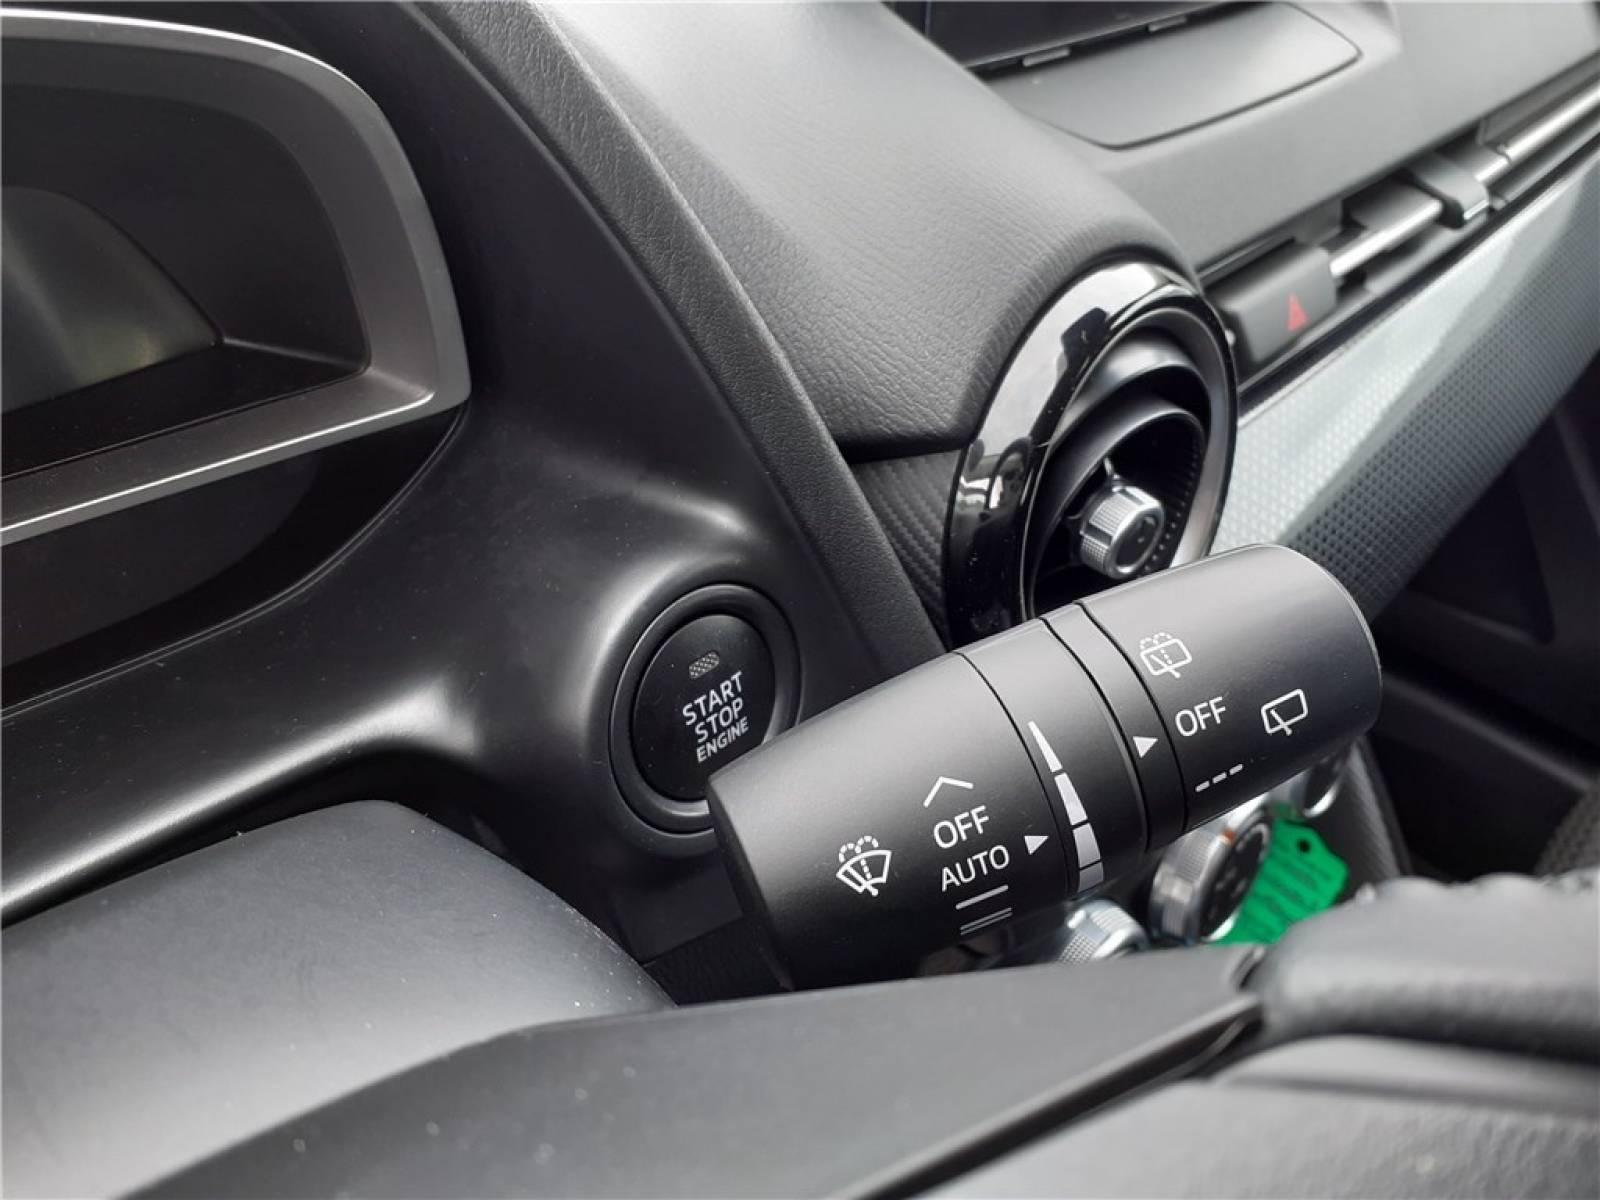 MAZDA Mazda2 1.5L SKYACTIV-G 90ch - véhicule d'occasion - Groupe Guillet - Chalon Automobiles - 71100 - Chalon-sur-Saône - 15